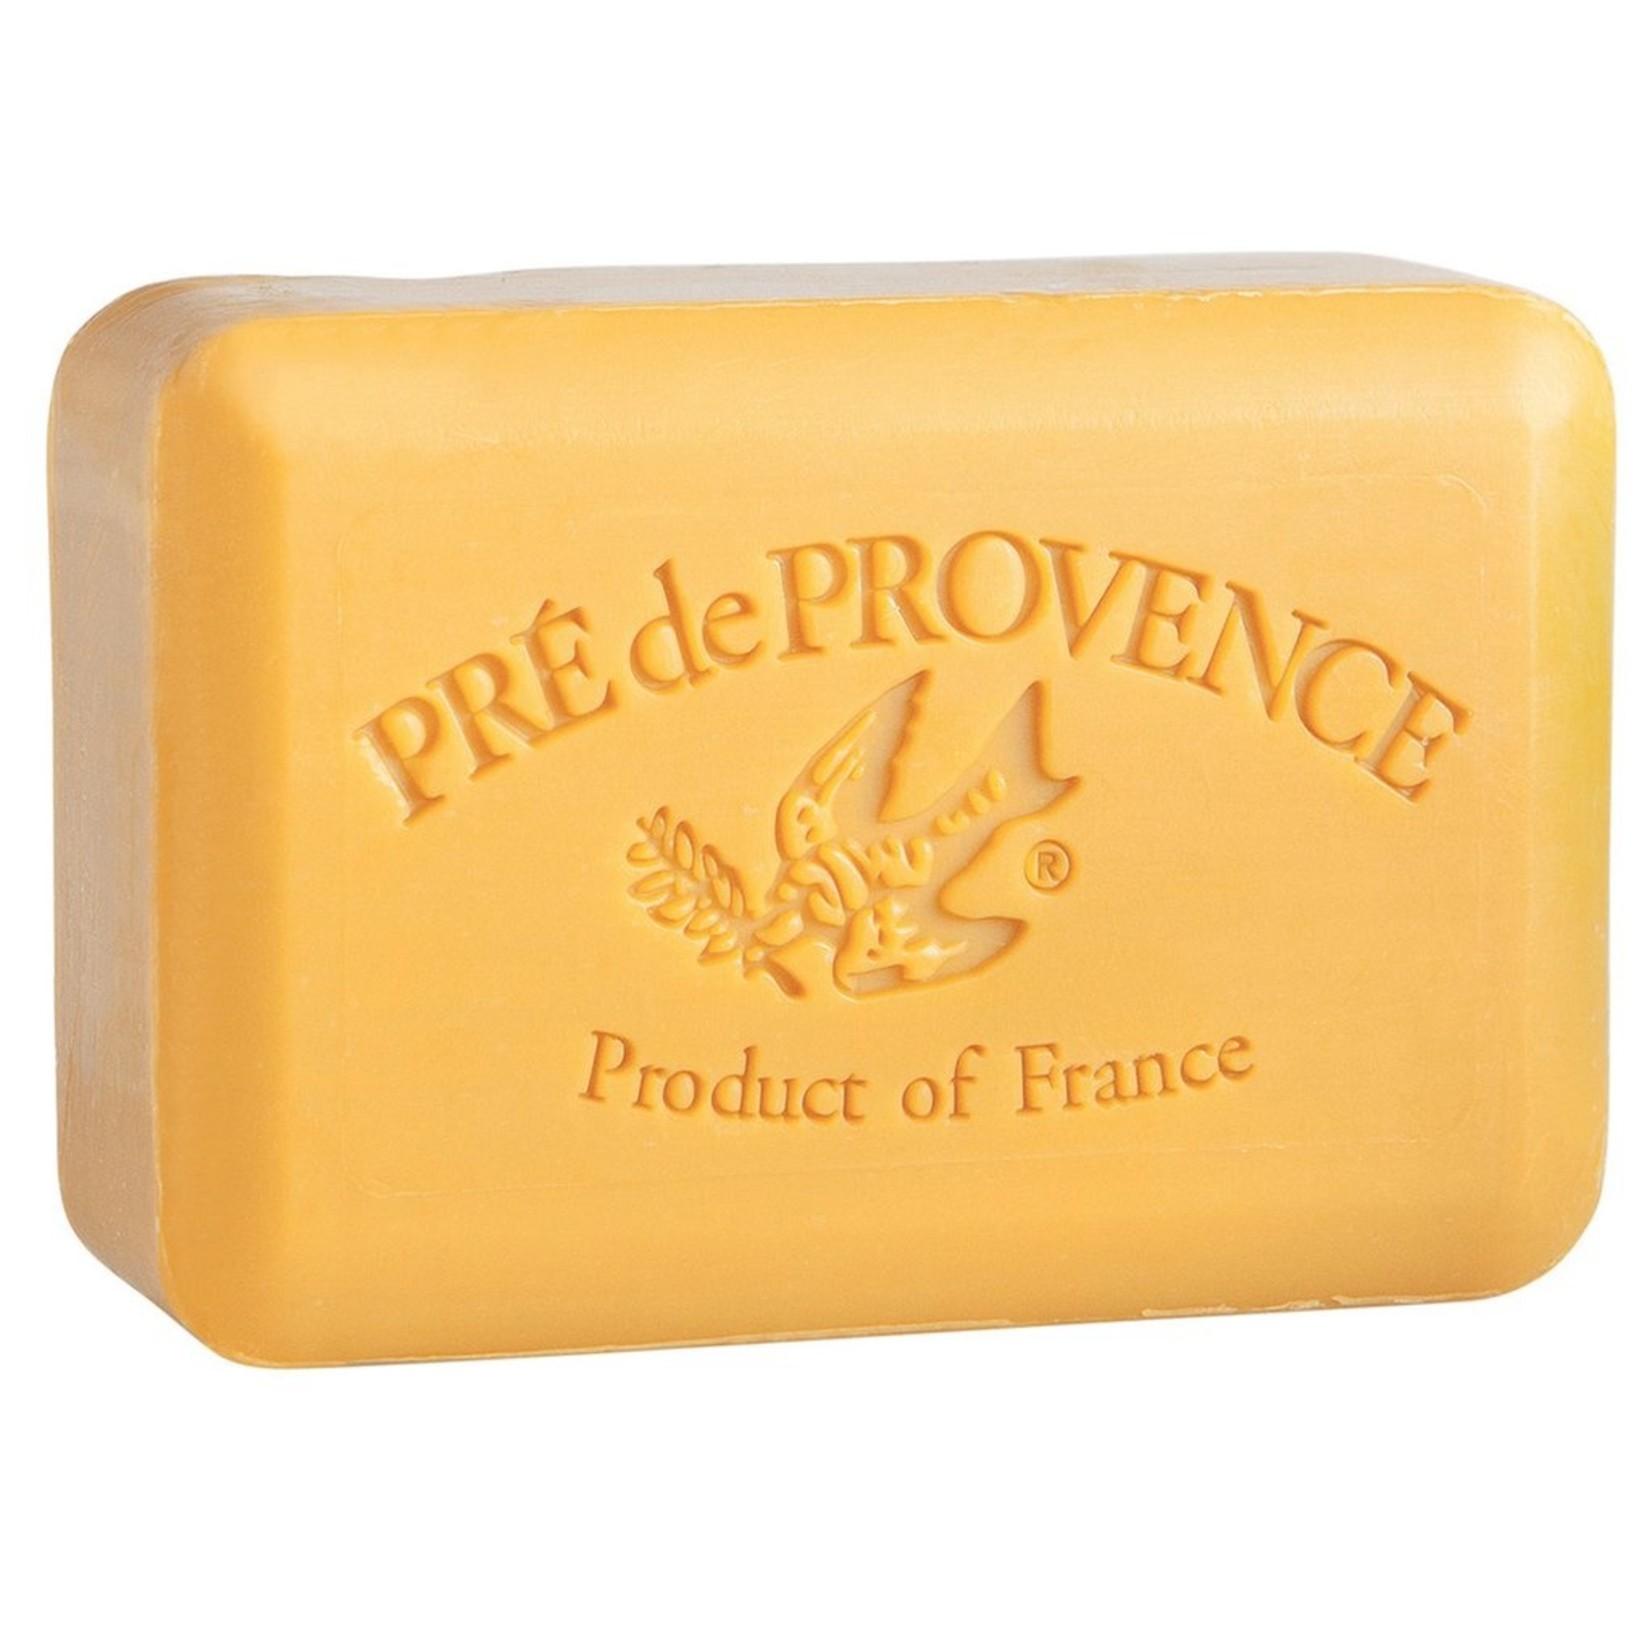 Pre de Provence Spiced Rum Soap Bar